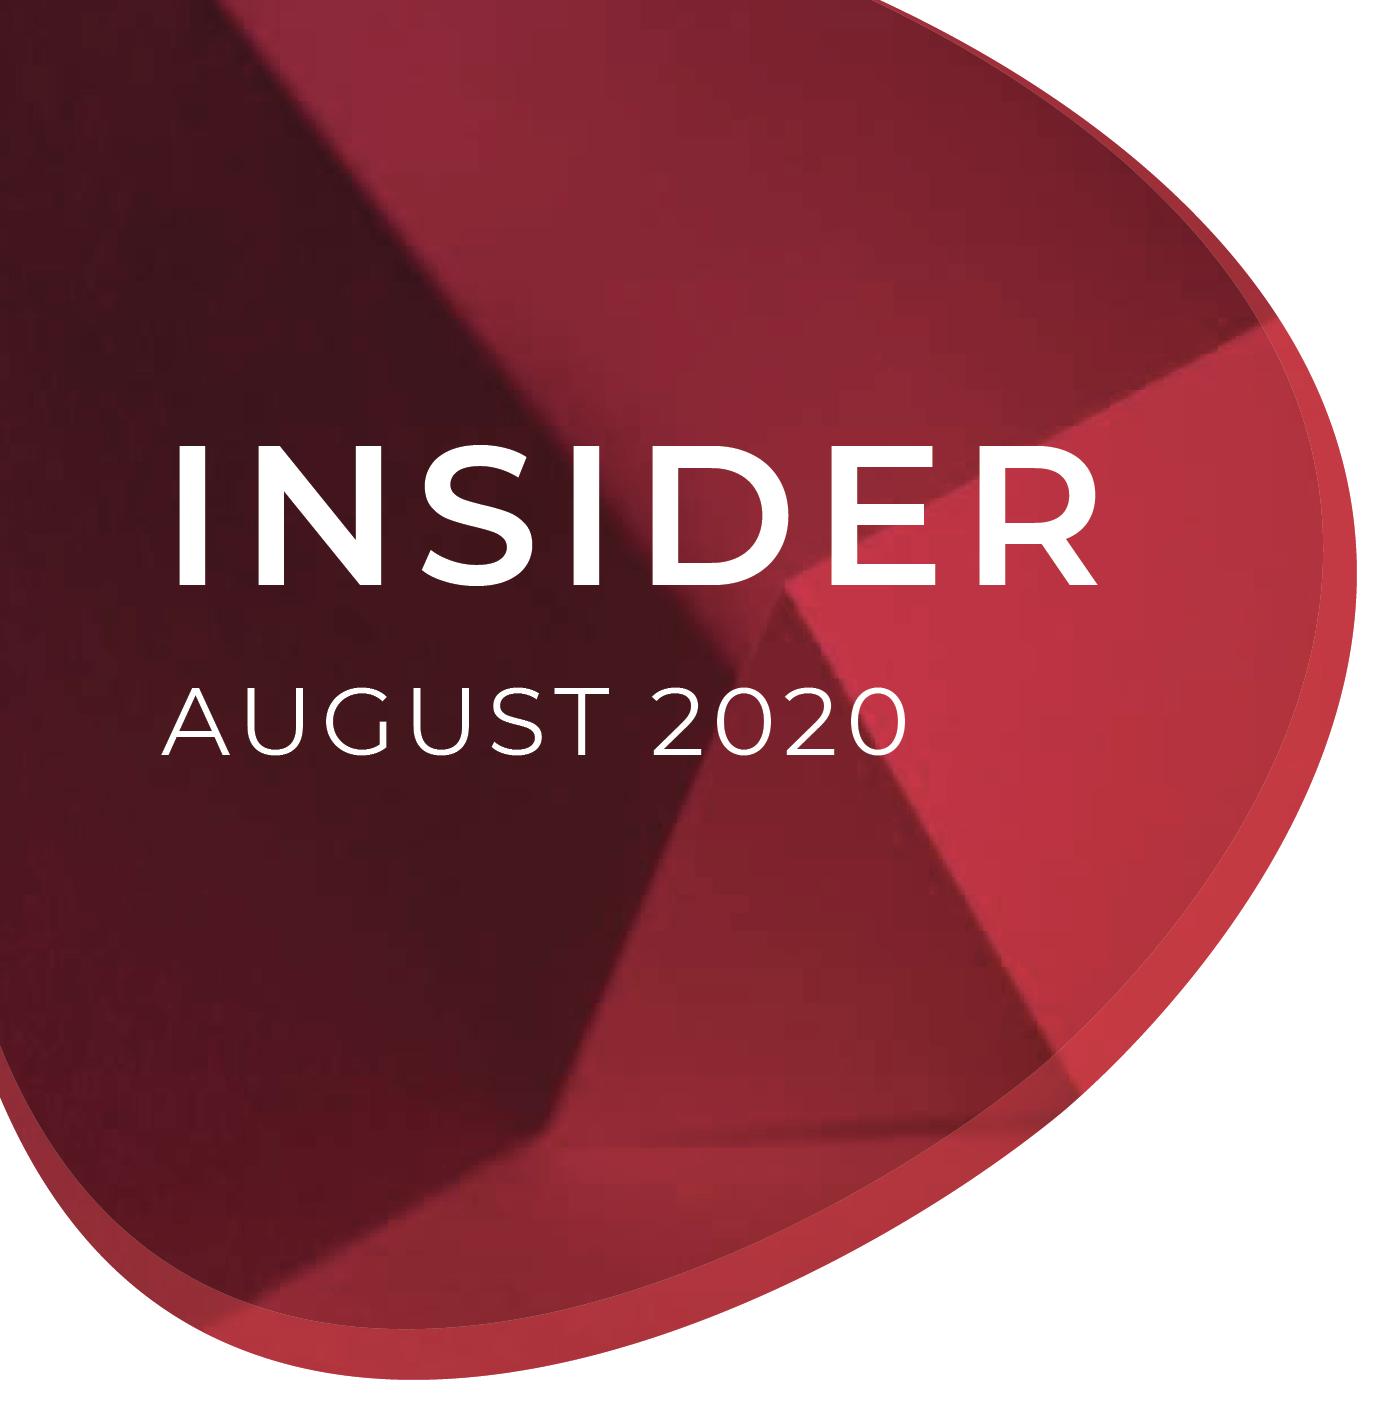 August Insider 2020